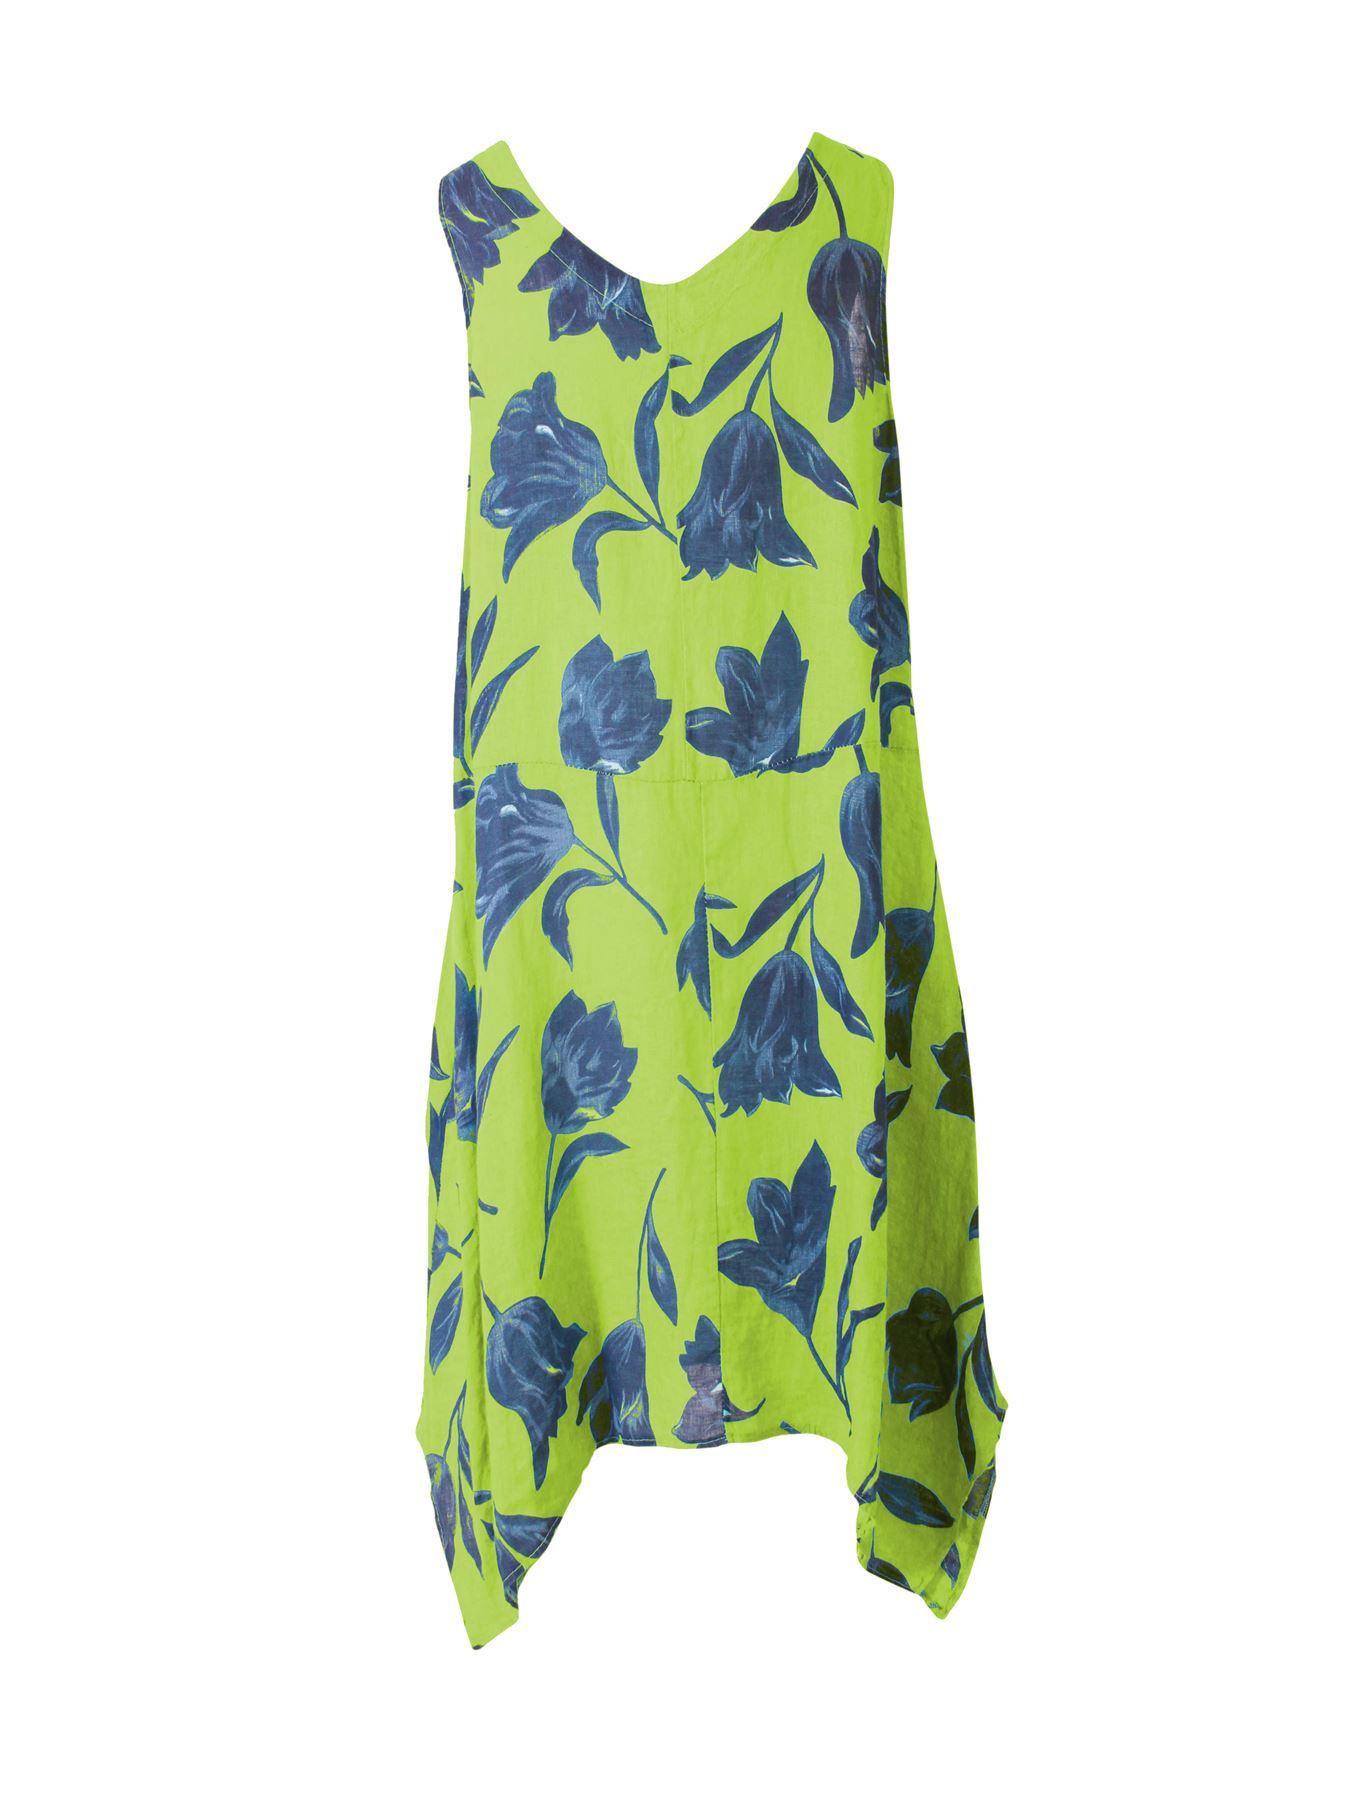 Womens-Tulip-Floral-Print-Italian-Lagenlook-Ladies-Linen-Dress-Two-Button-V-Neck thumbnail 13